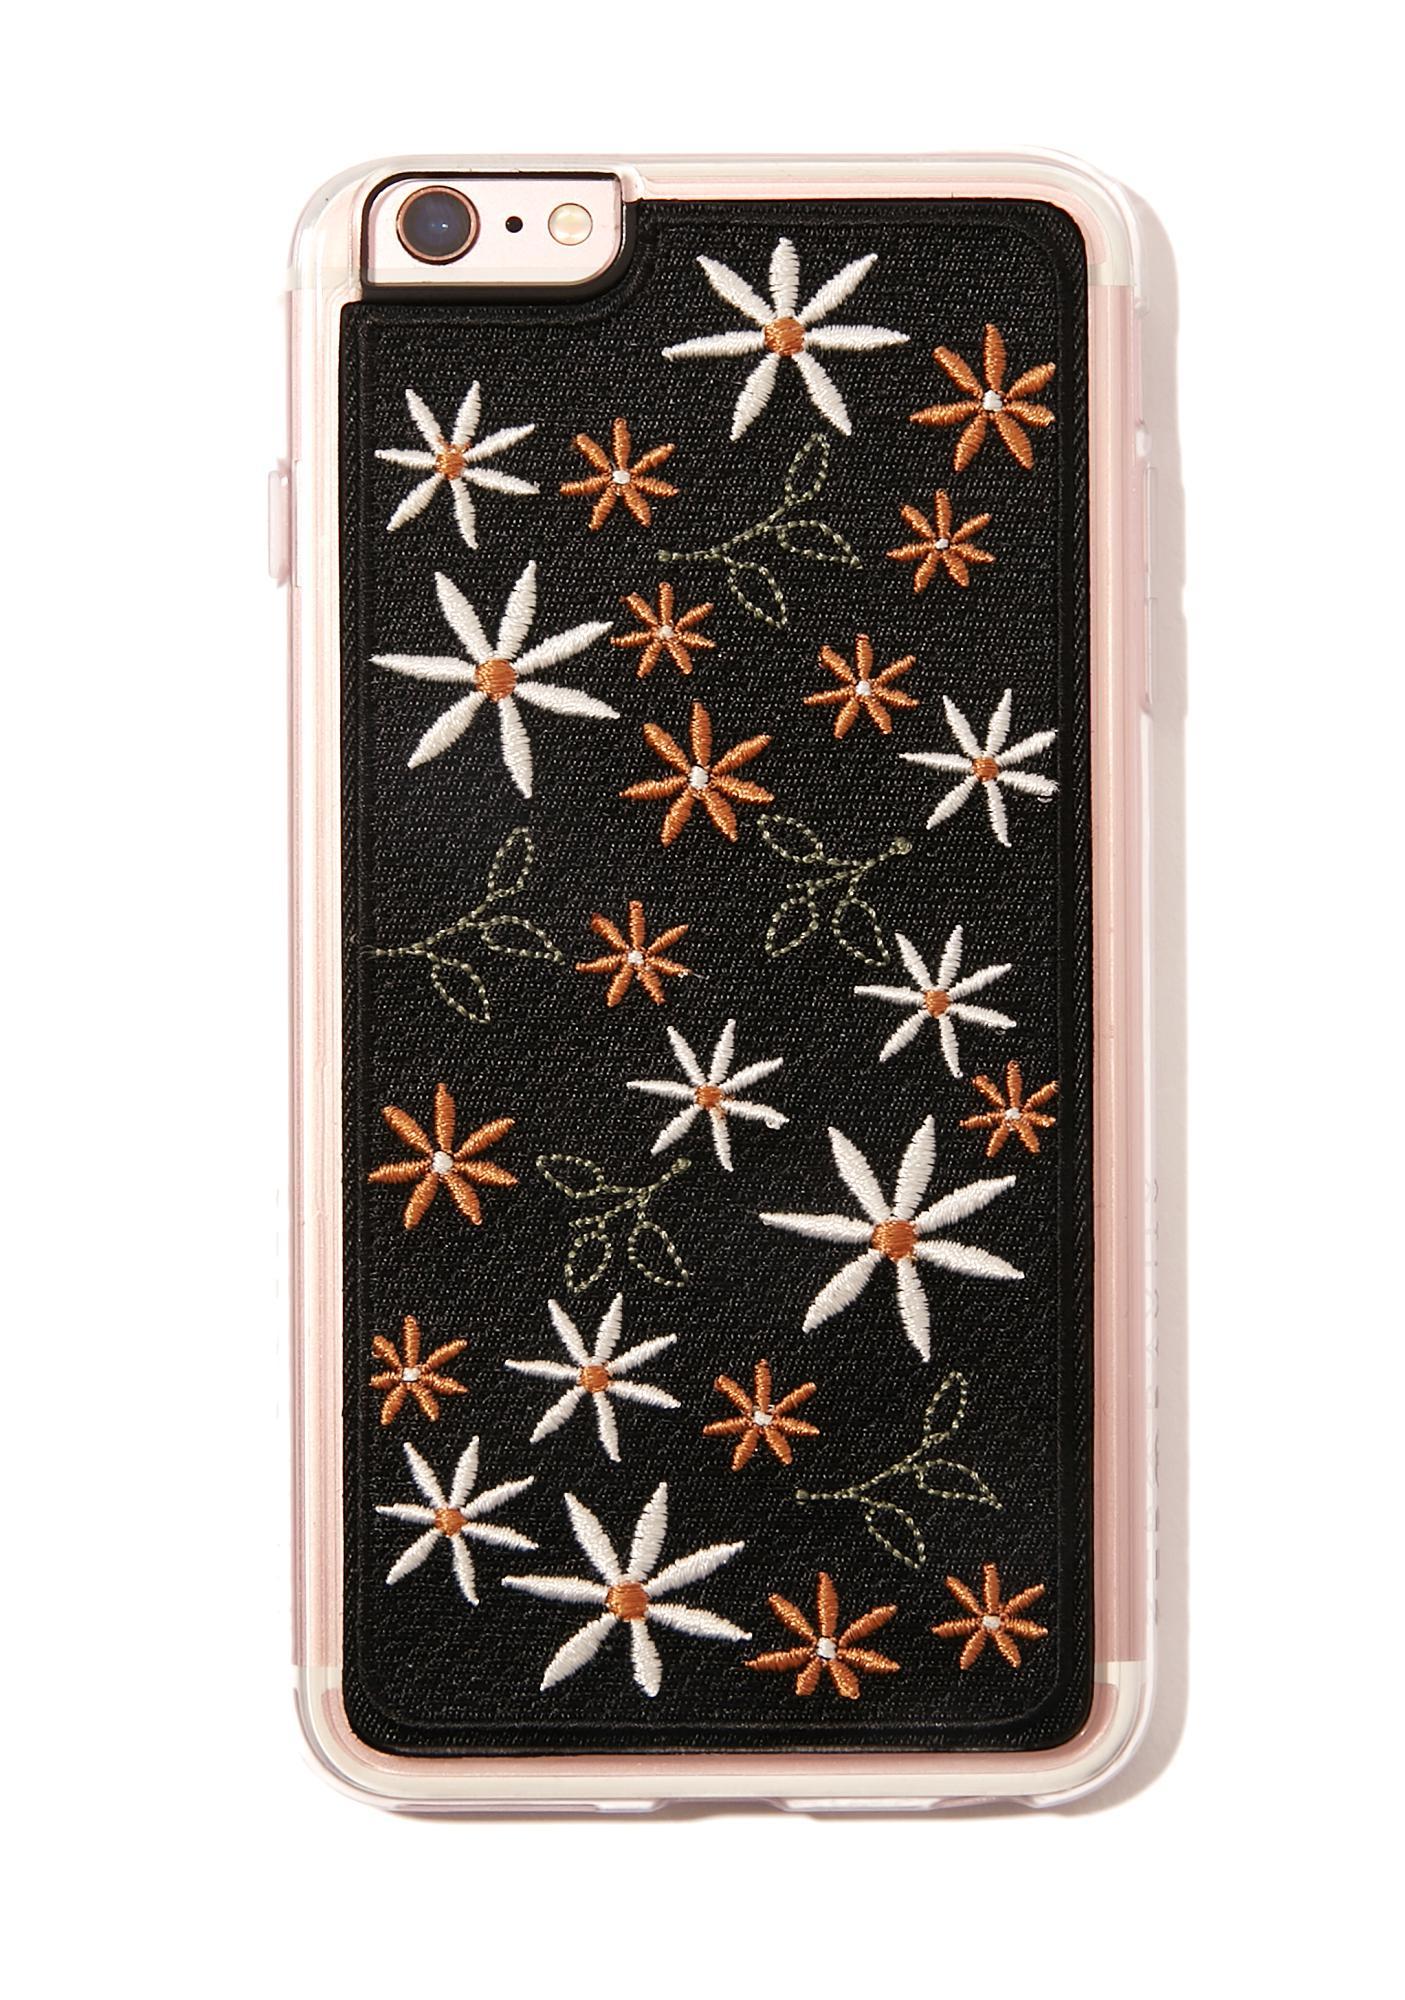 Zero Gravity Wander Embroidered iPhone Case